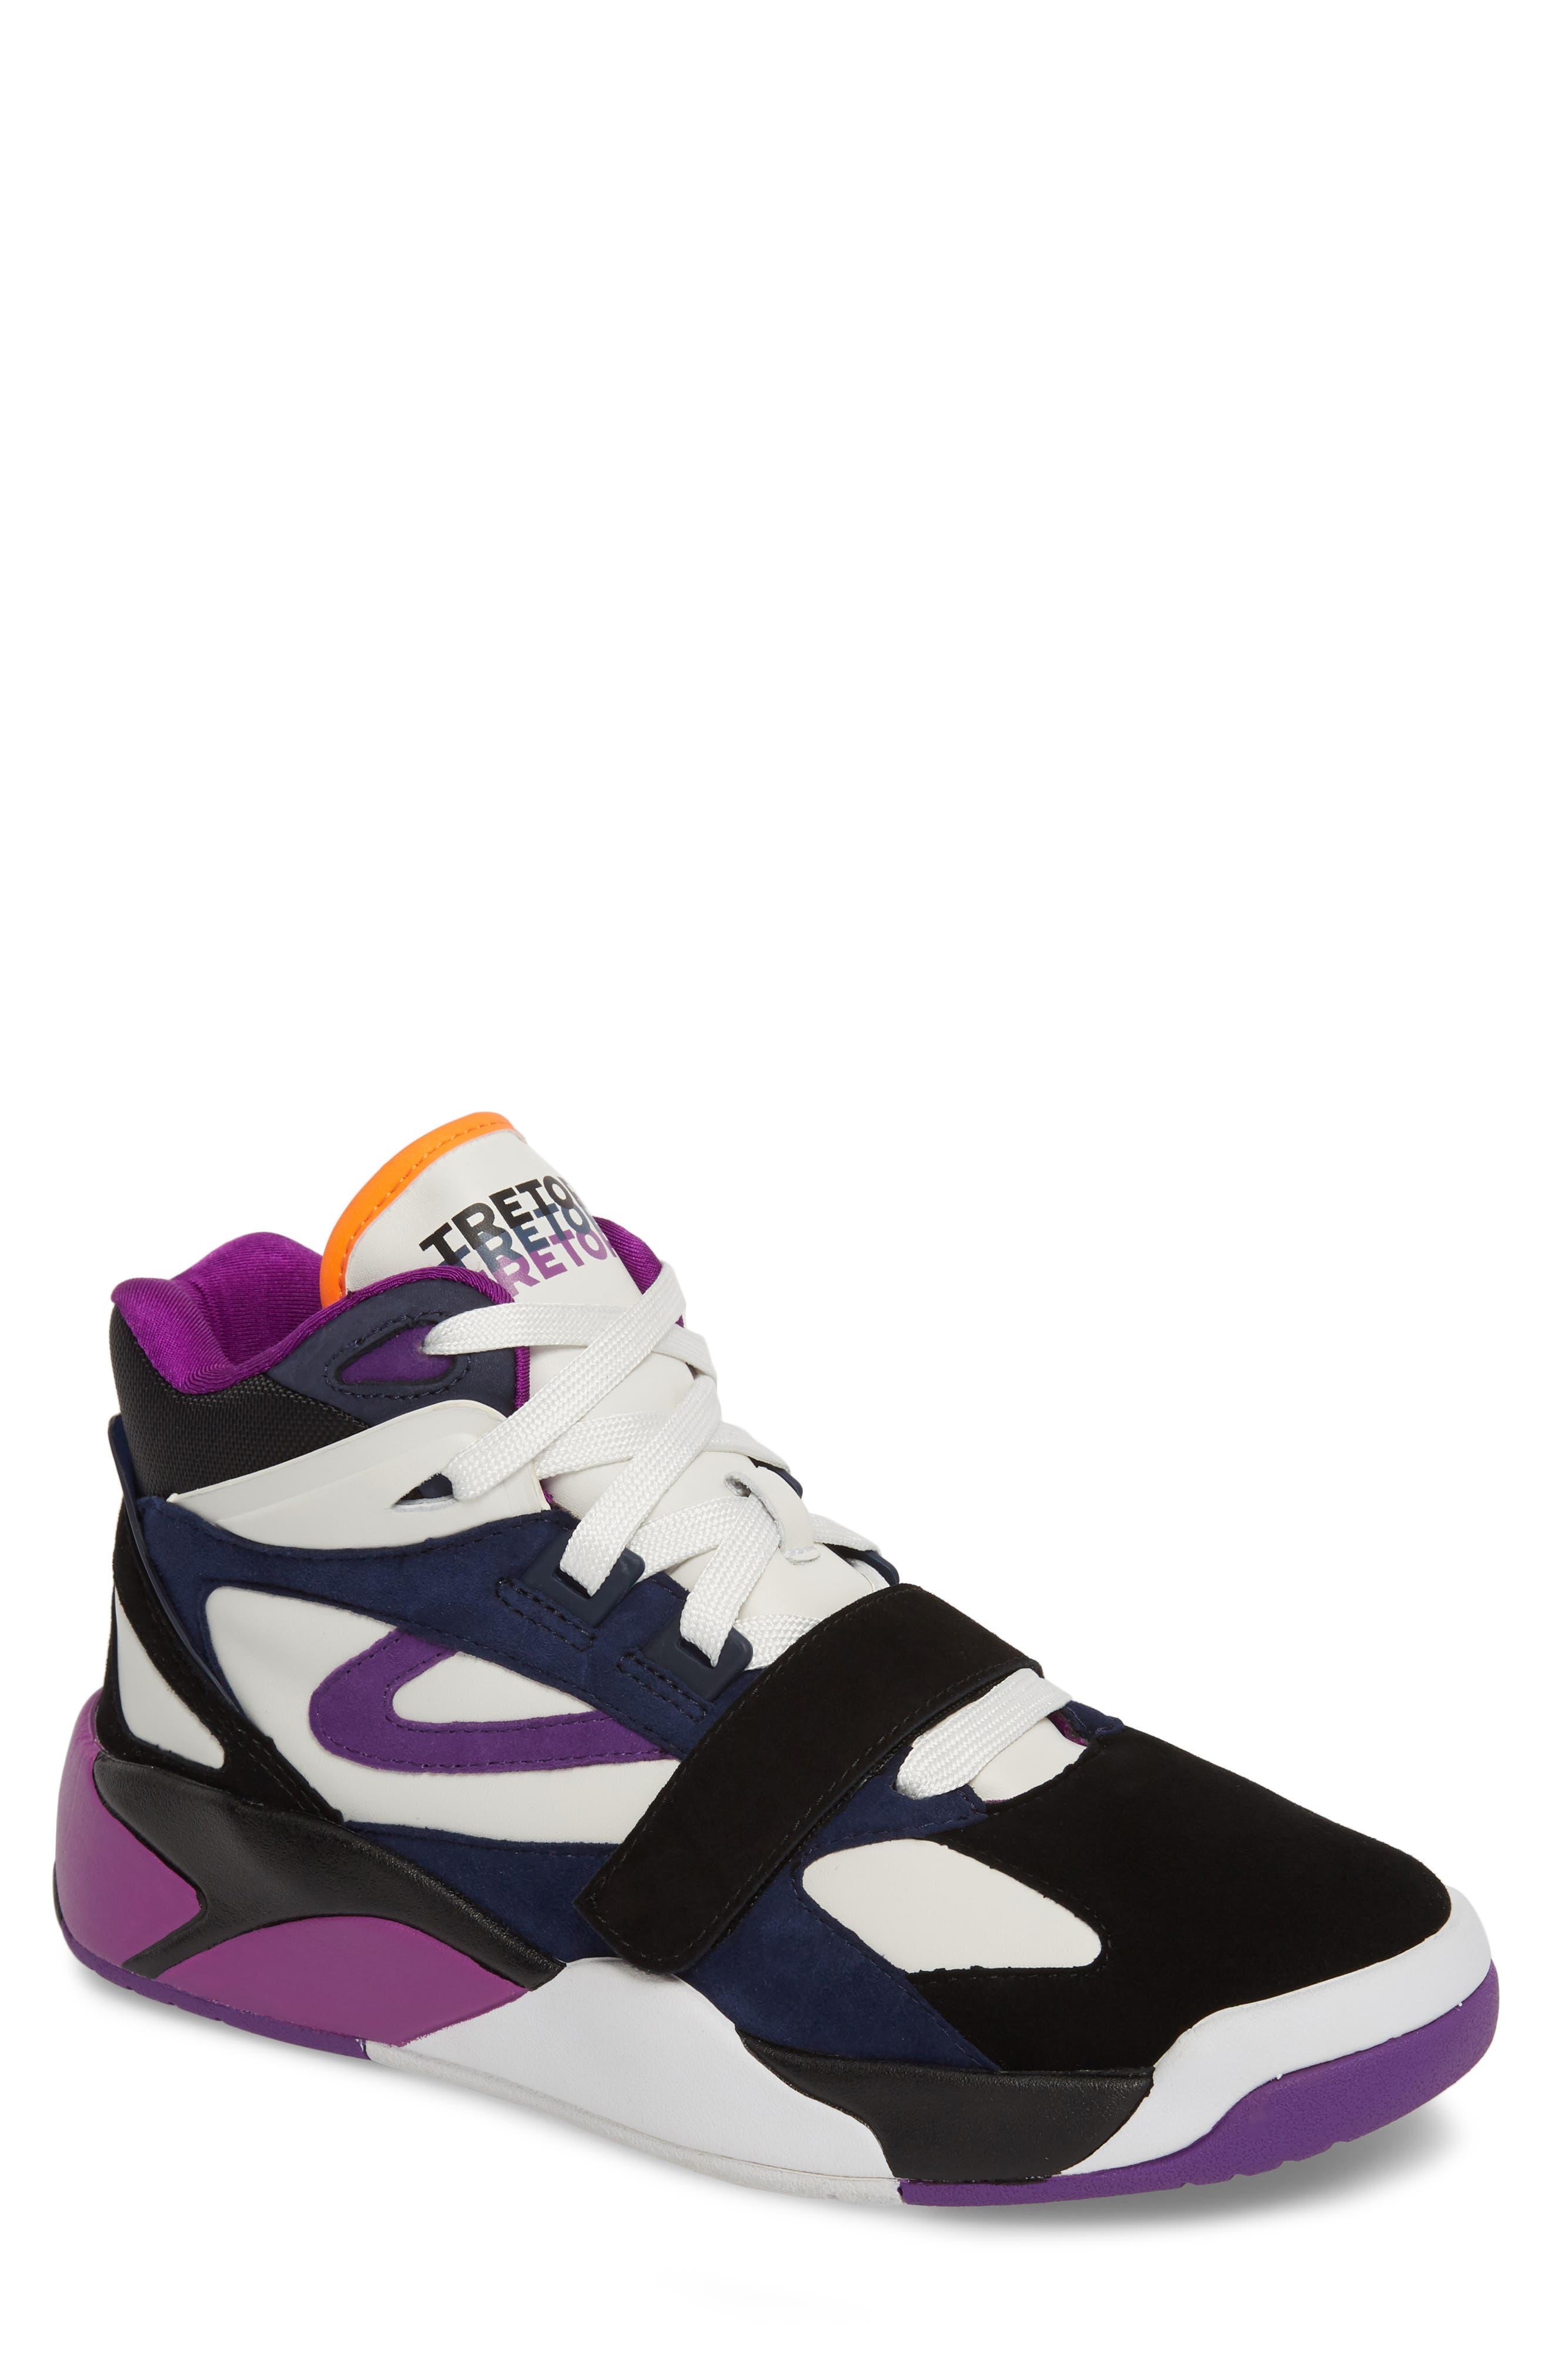 Andre 3000 Bostad 2 High Top Sneaker,                         Main,                         color, Black/ White/ Purple